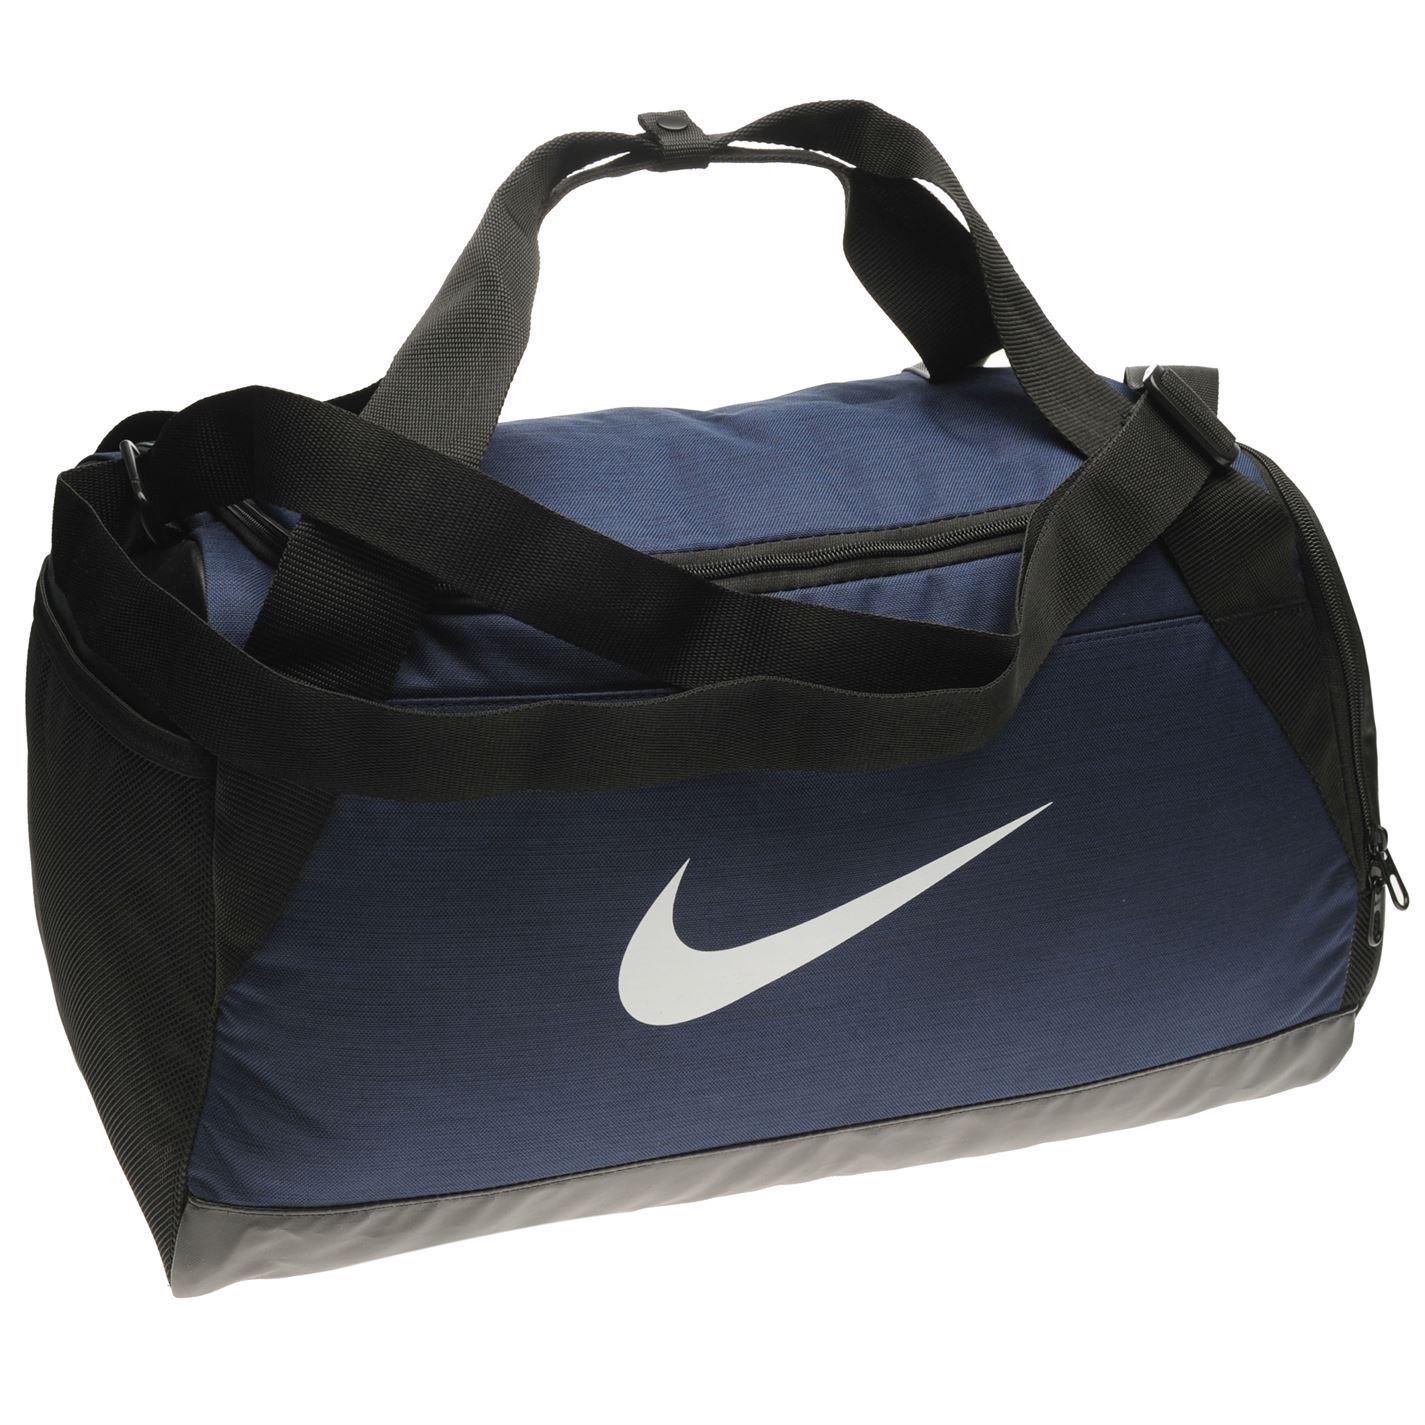 34435c781c Nike Brasilia X Small Duffle Bag